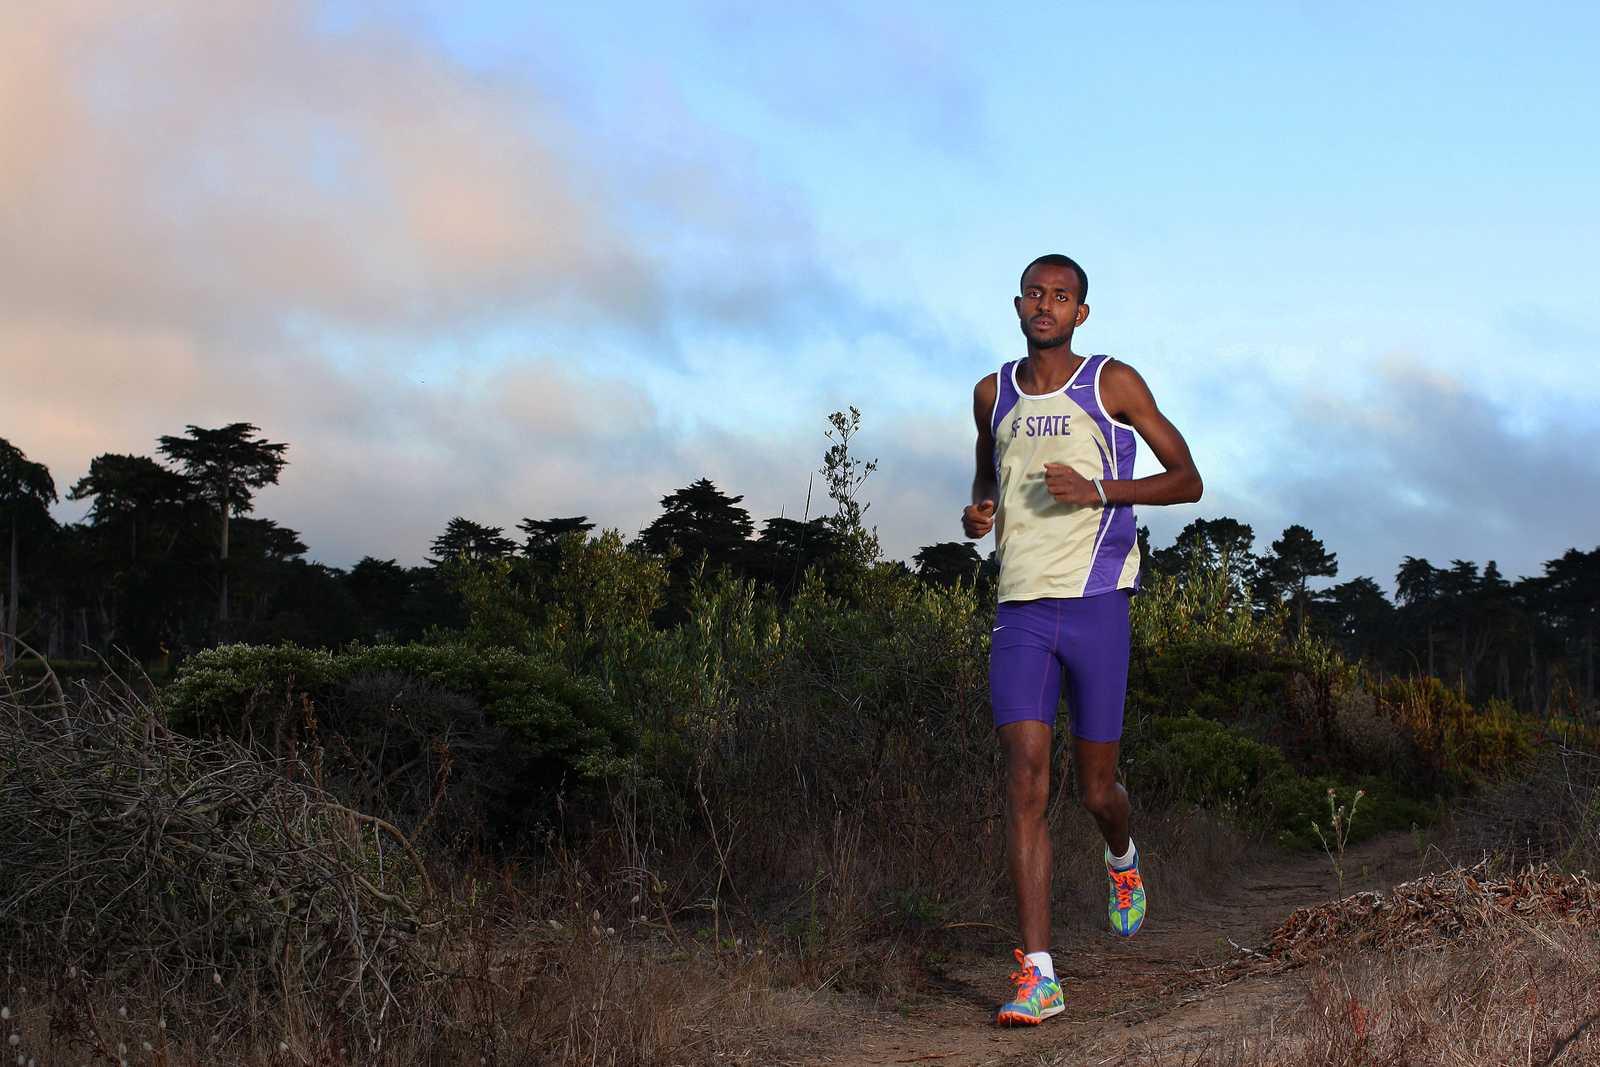 Senior cross country runner Bruk Assefa poses for a portrait near Lake Merced on August 30, 2013. Photo by Tony Santos / Xpress